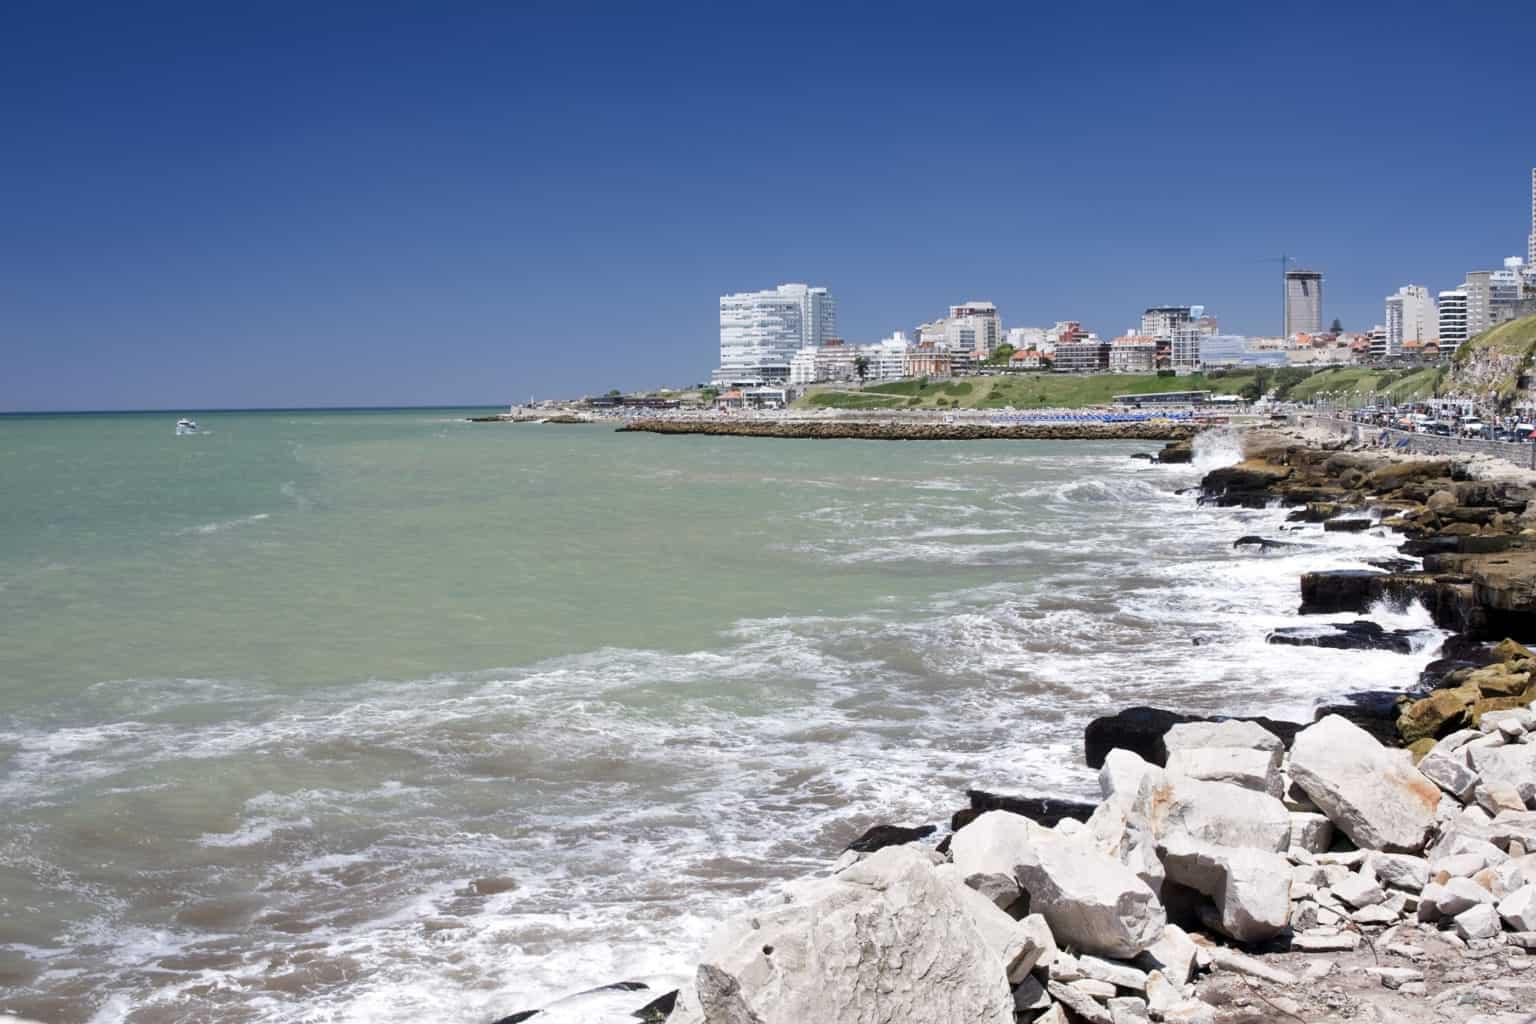 Walking tour in Mar del Plata